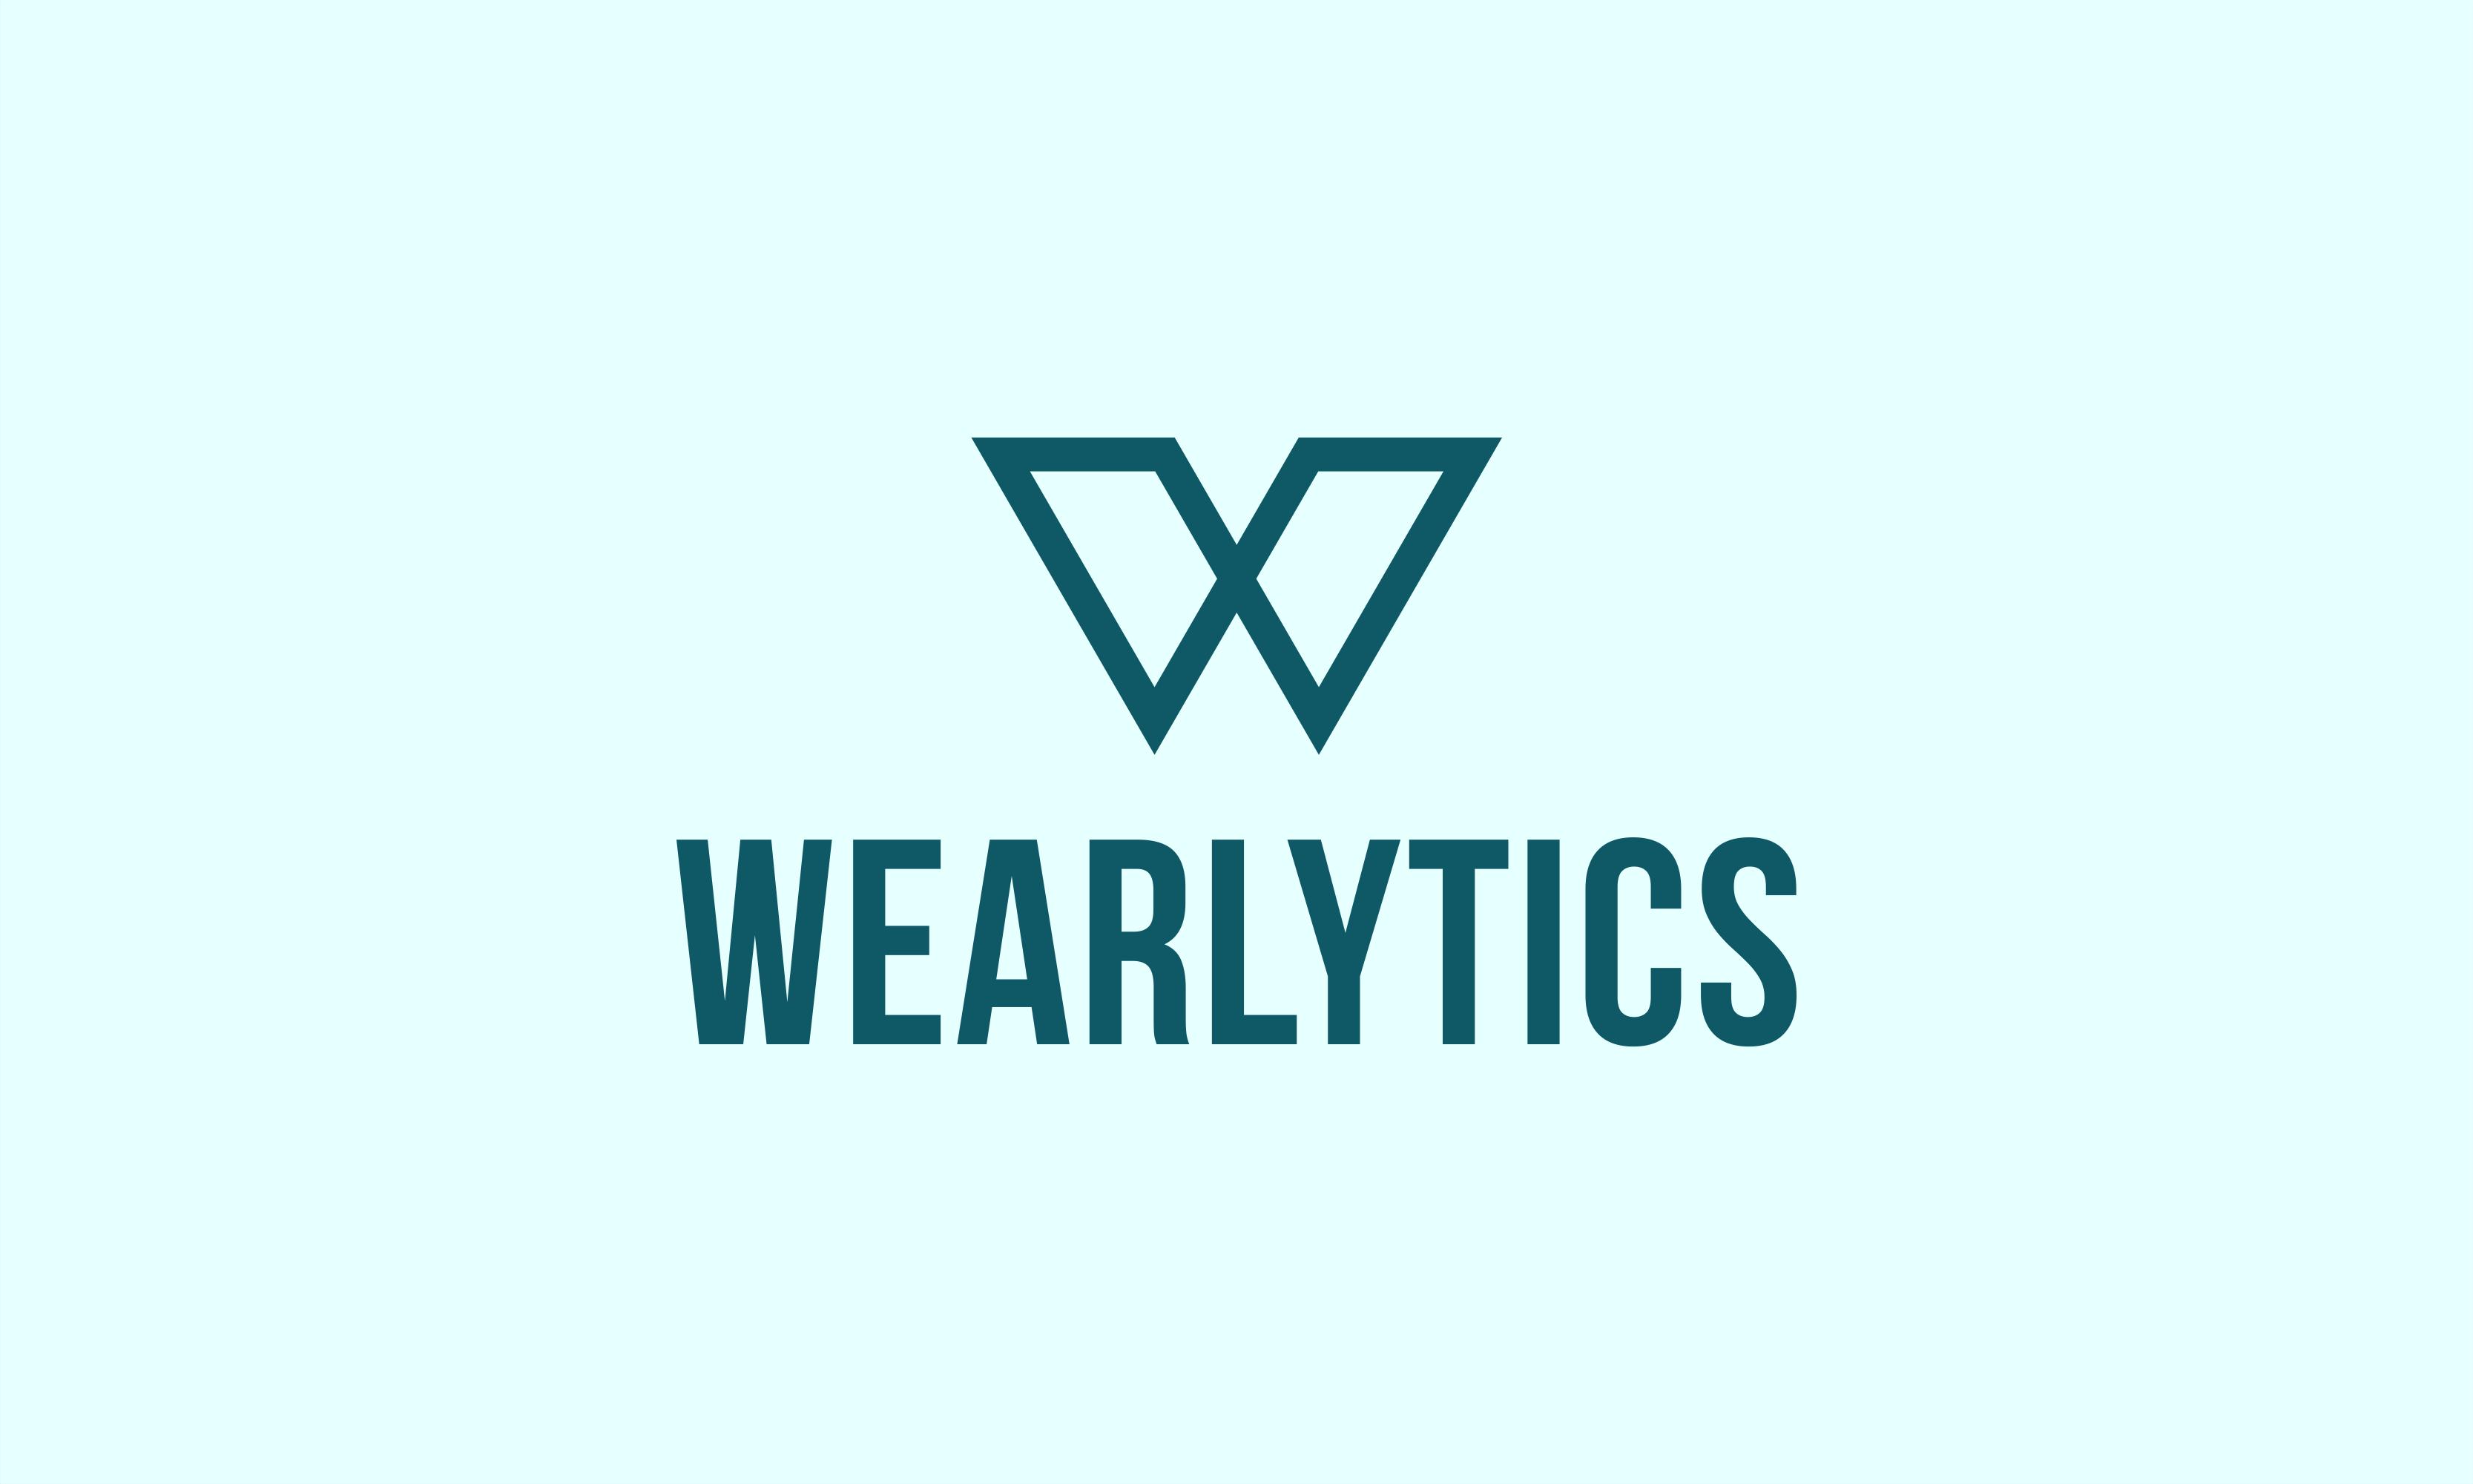 Wearlytics